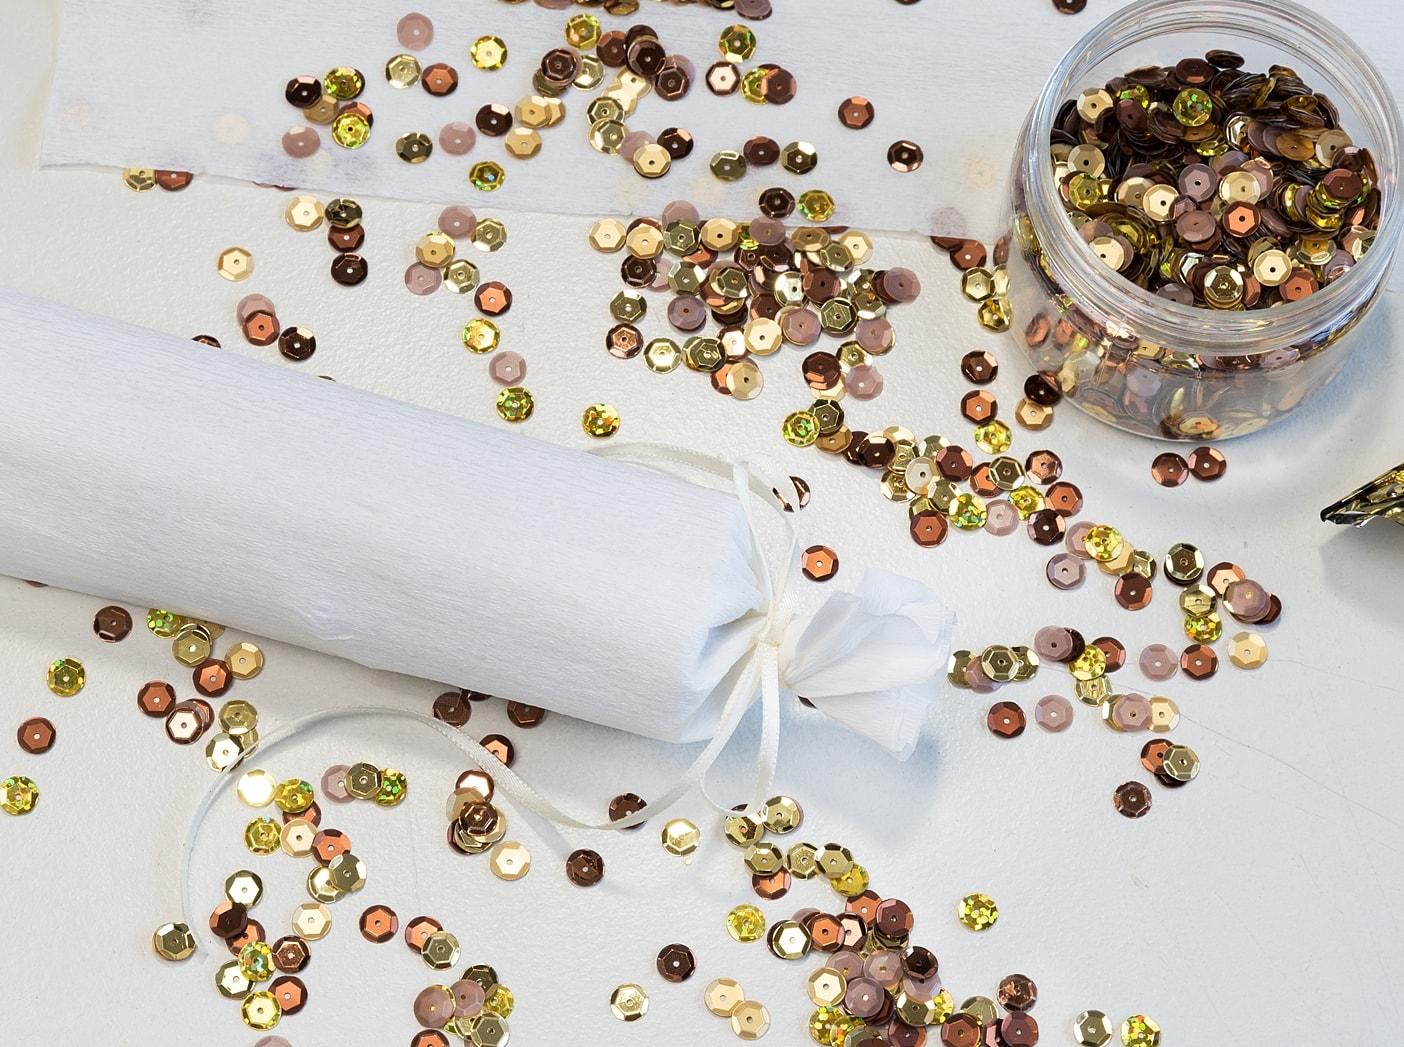 Silvesterdeko selber machen - Partyhut & Knallbonbons - White and ...